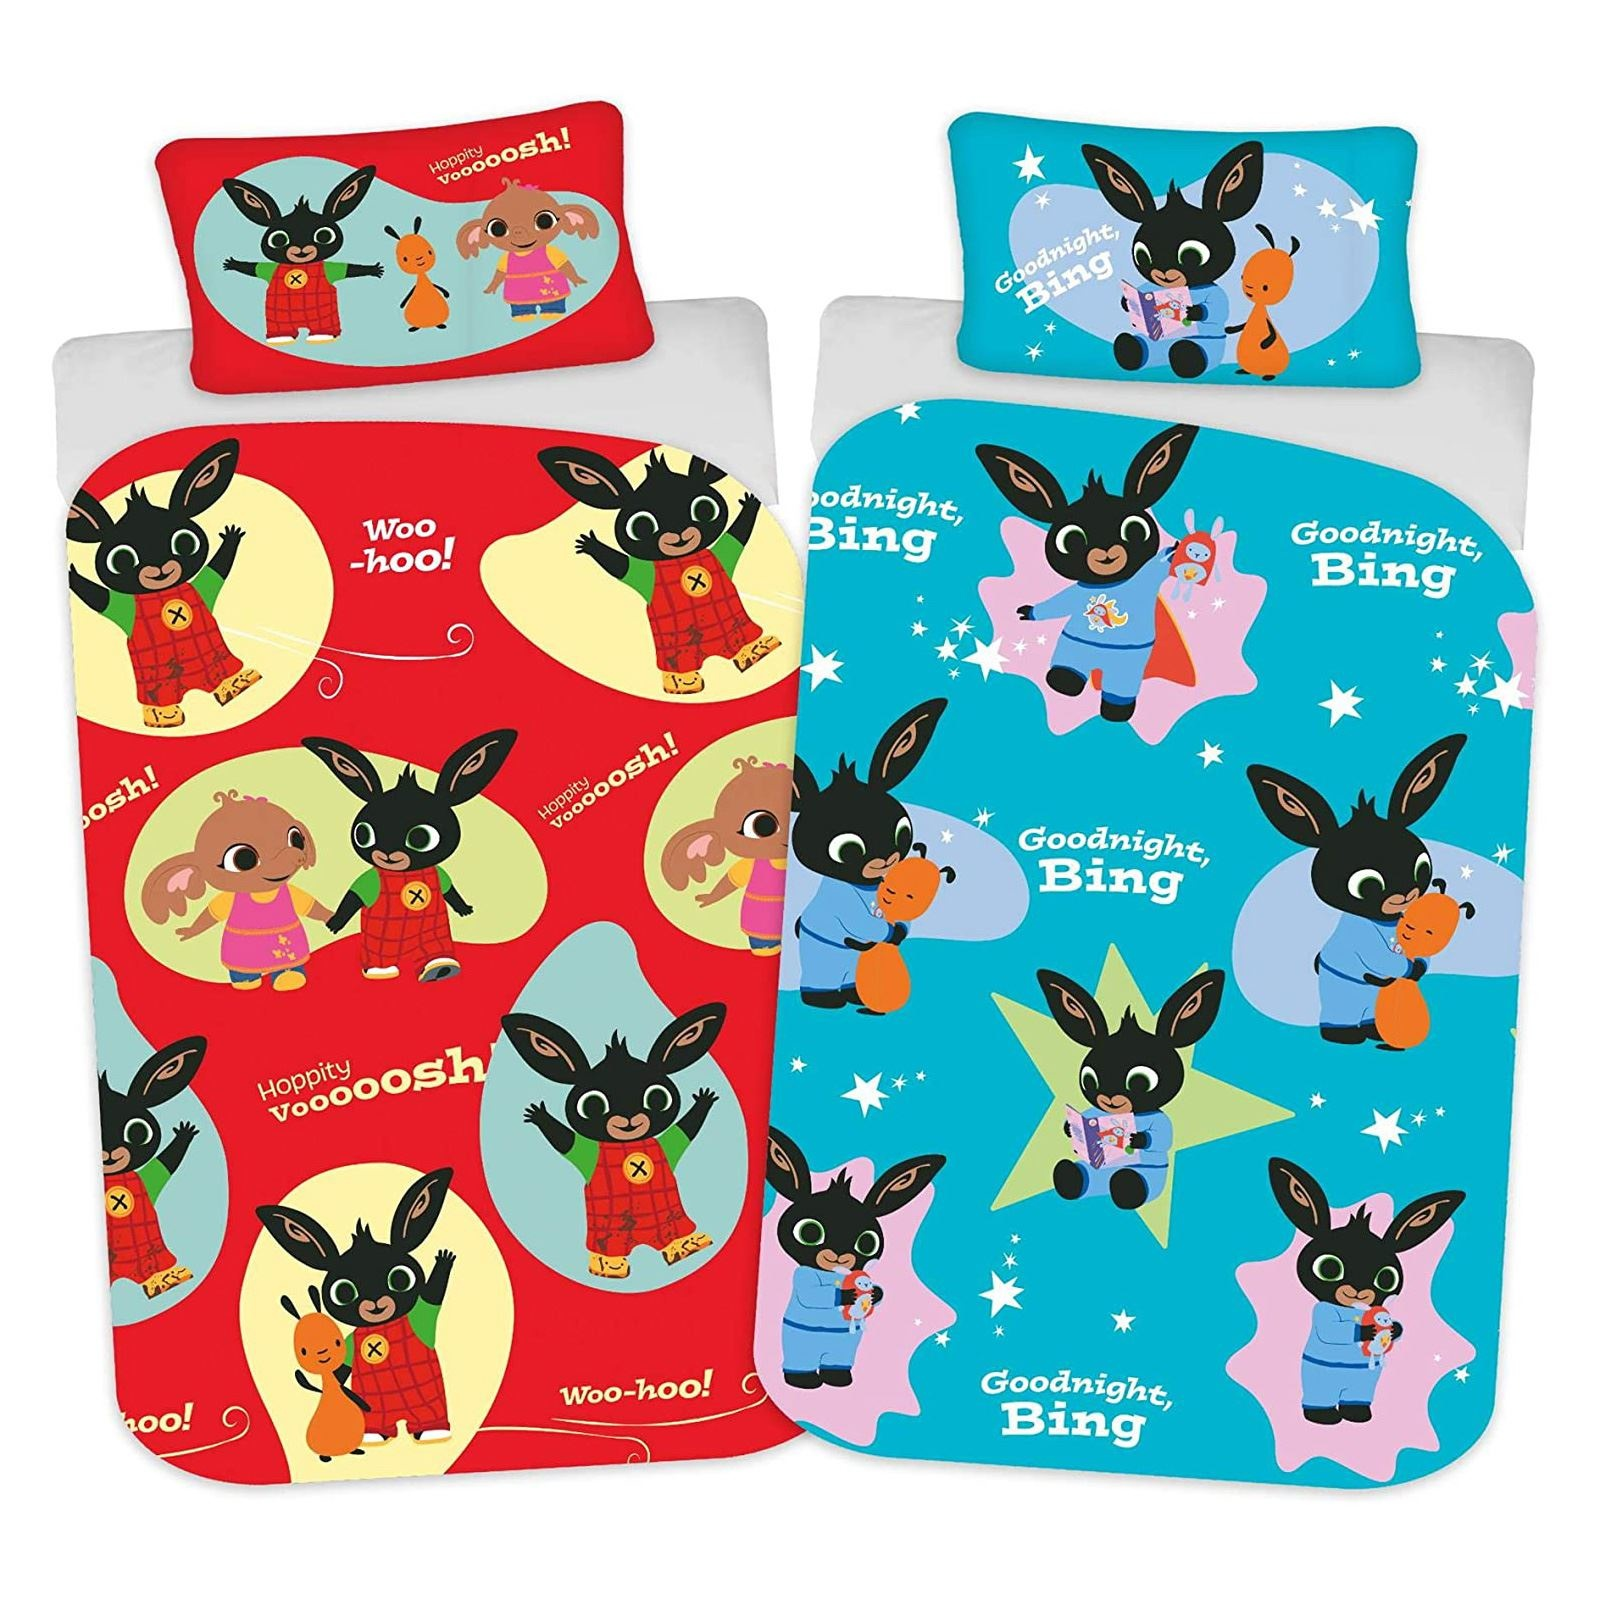 Bing Bunny Bing Bunny Junior Duvet Cover Set Hoppity Voosh Whoosh